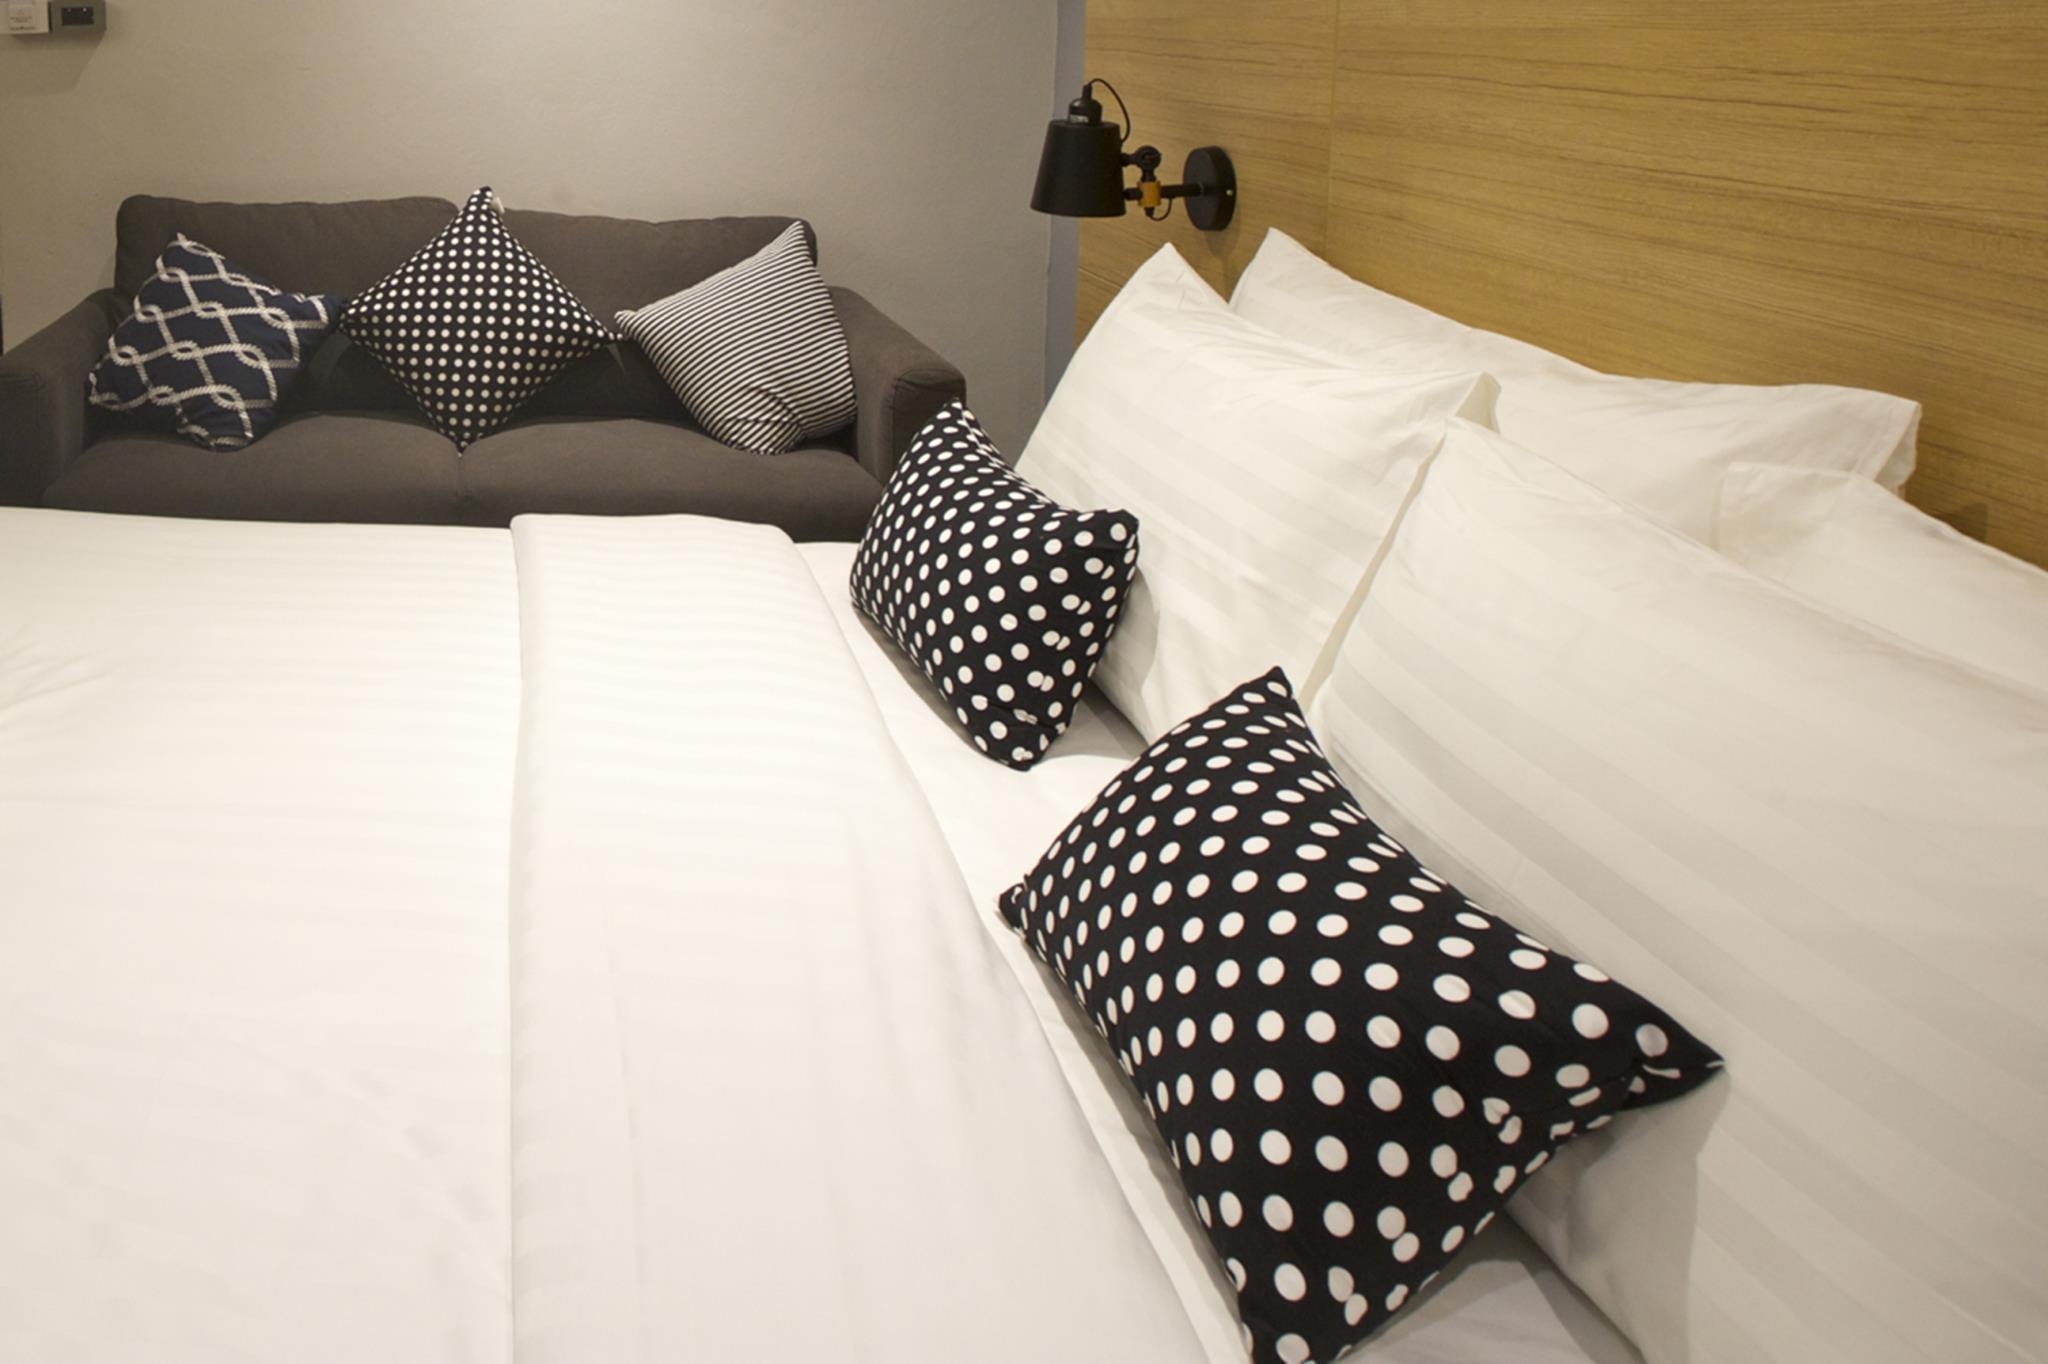 The Plug hotel @ i-Biz Avenue,The Plug hotel @ i-Biz Avenue